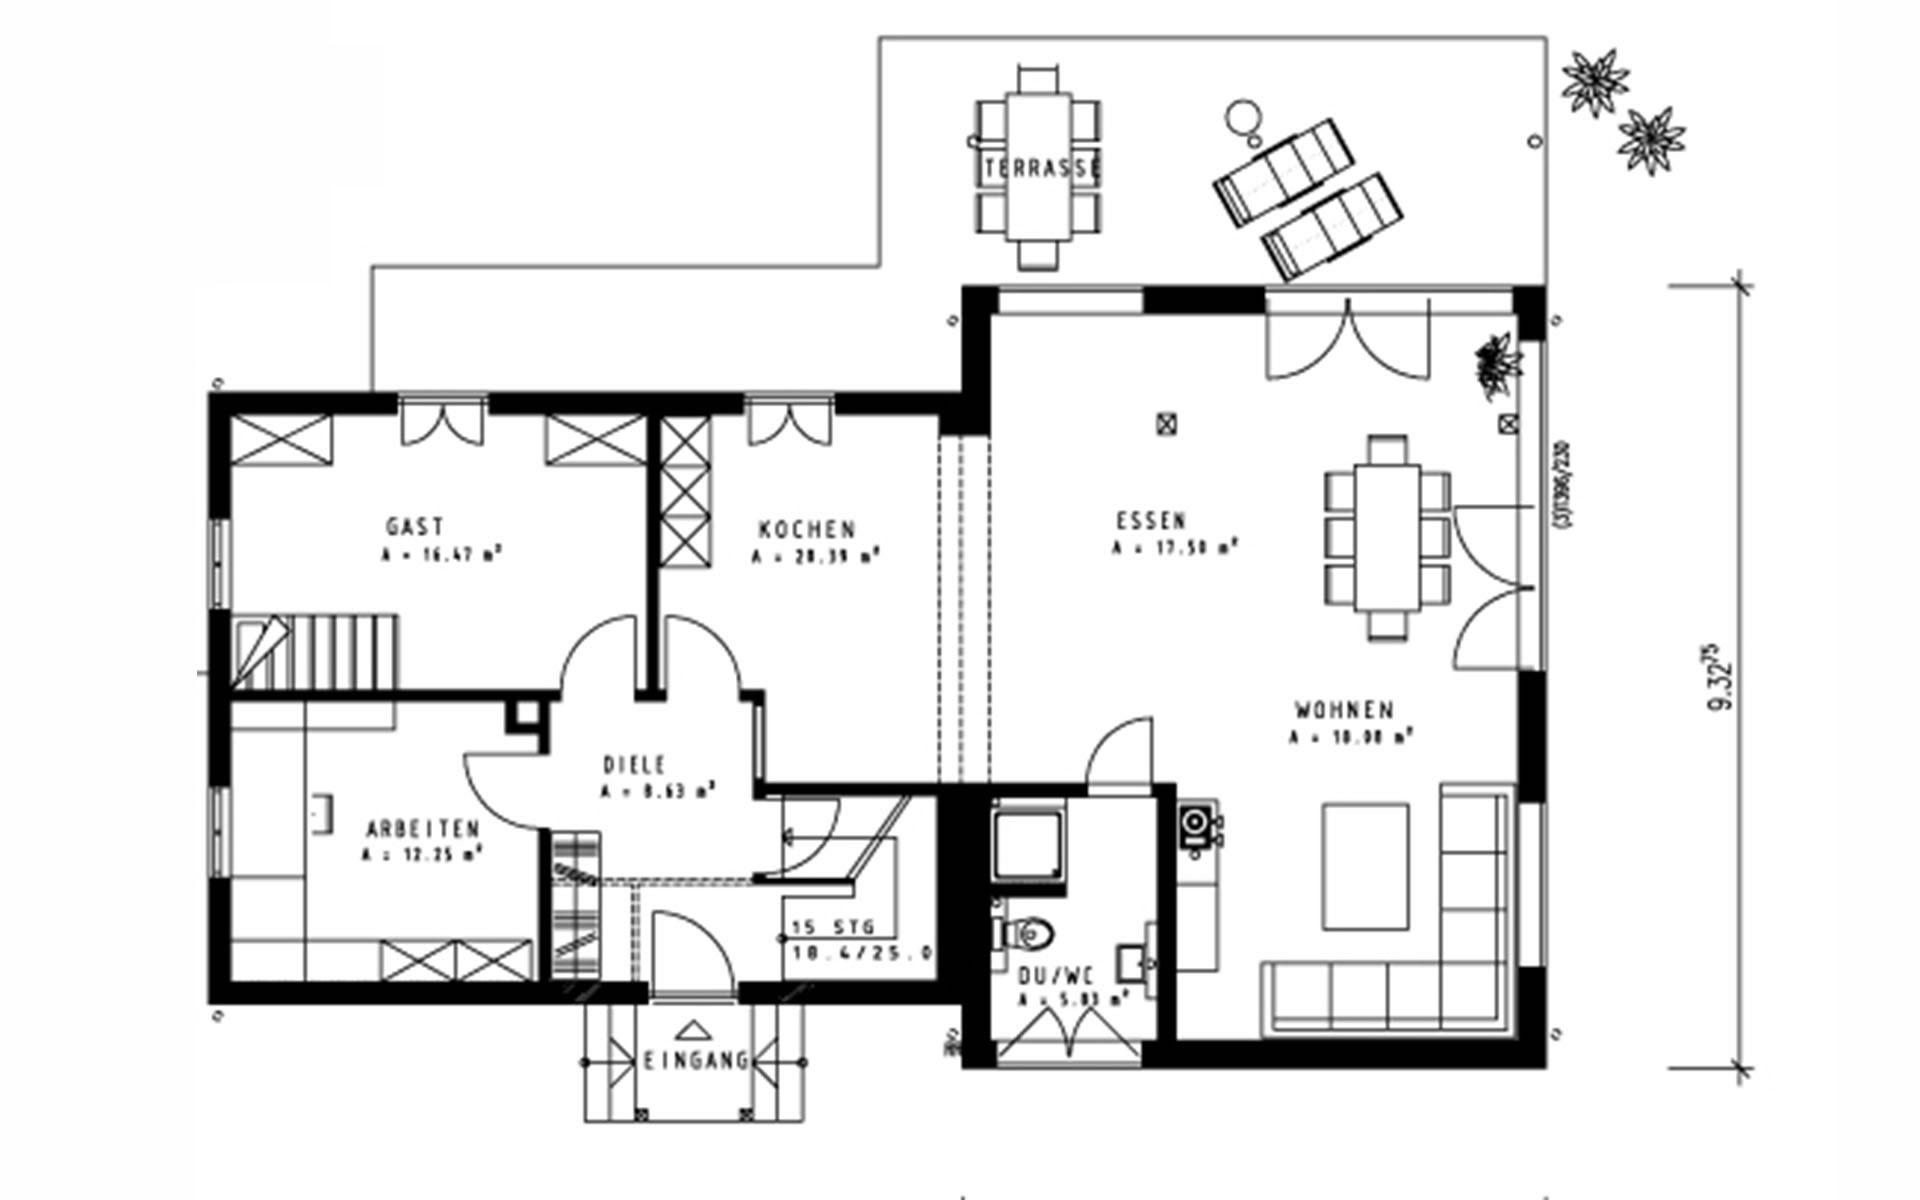 Erdgeschoss Mangold von Sonnleitner Holzbauwerke GmbH & Co. KG